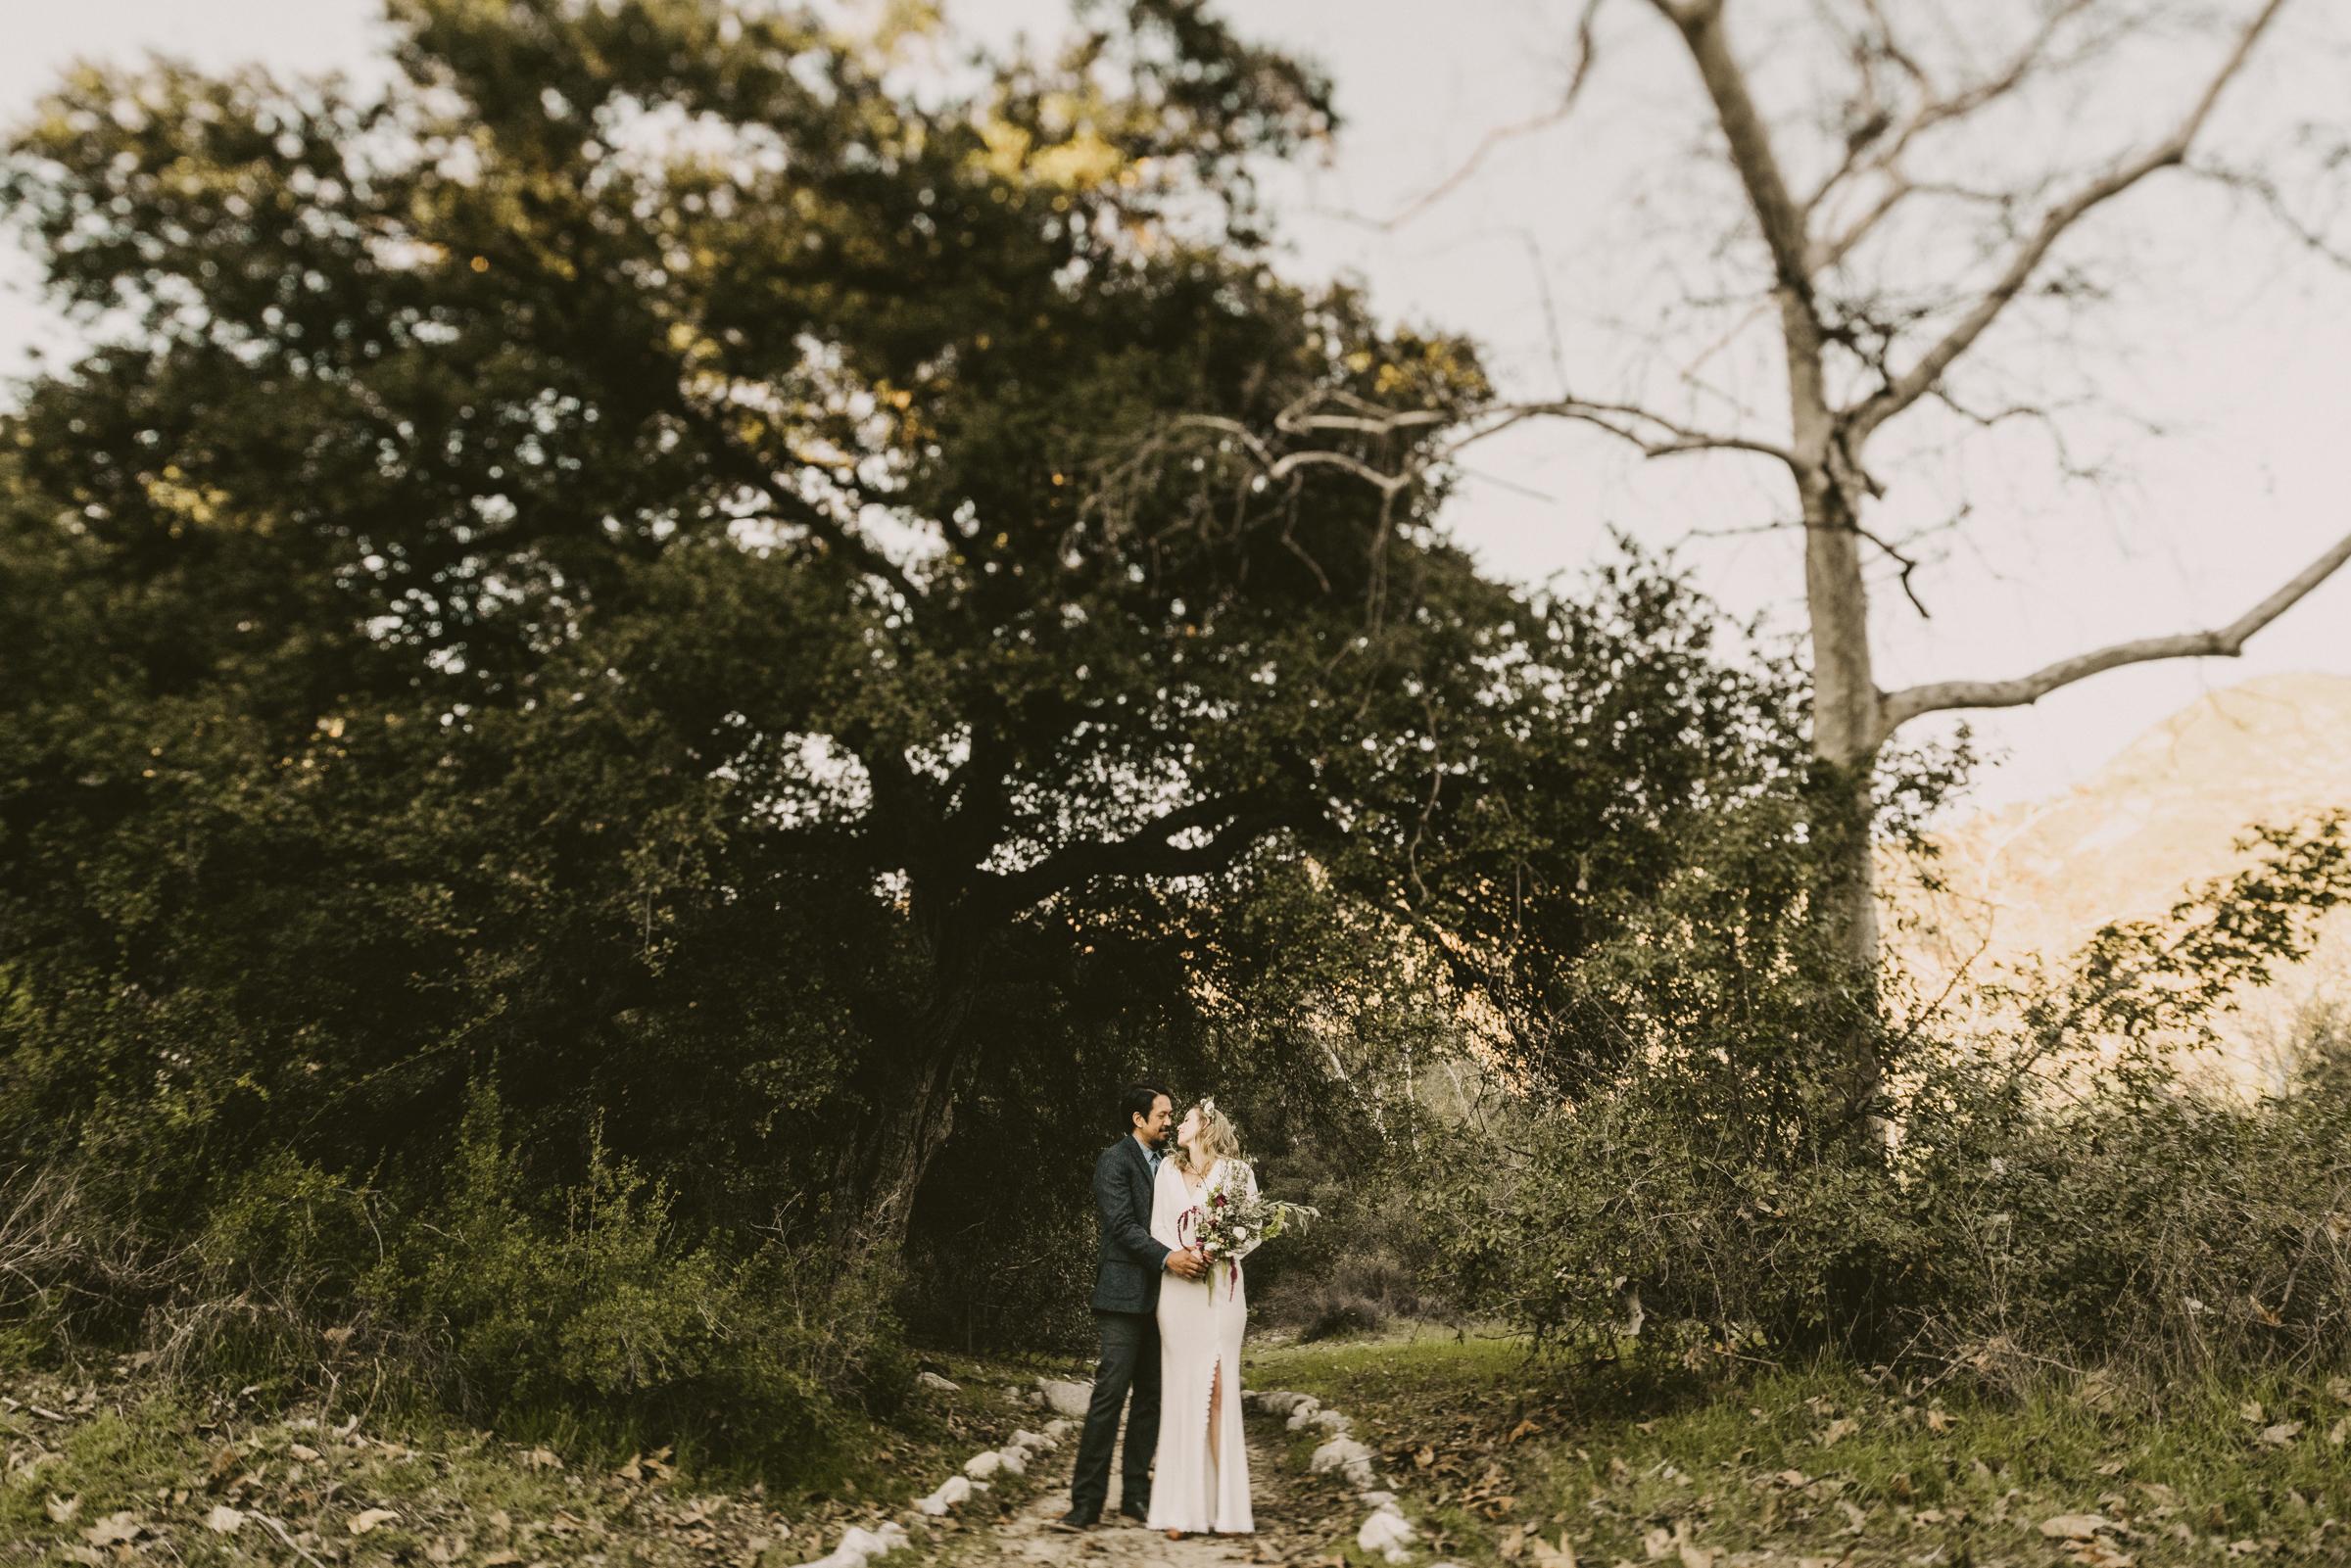 ©Isaiah + Taylor Photography - Intimate Elopement, Eaton Canyon, Los Angeles Wedding Photographer-54.jpg